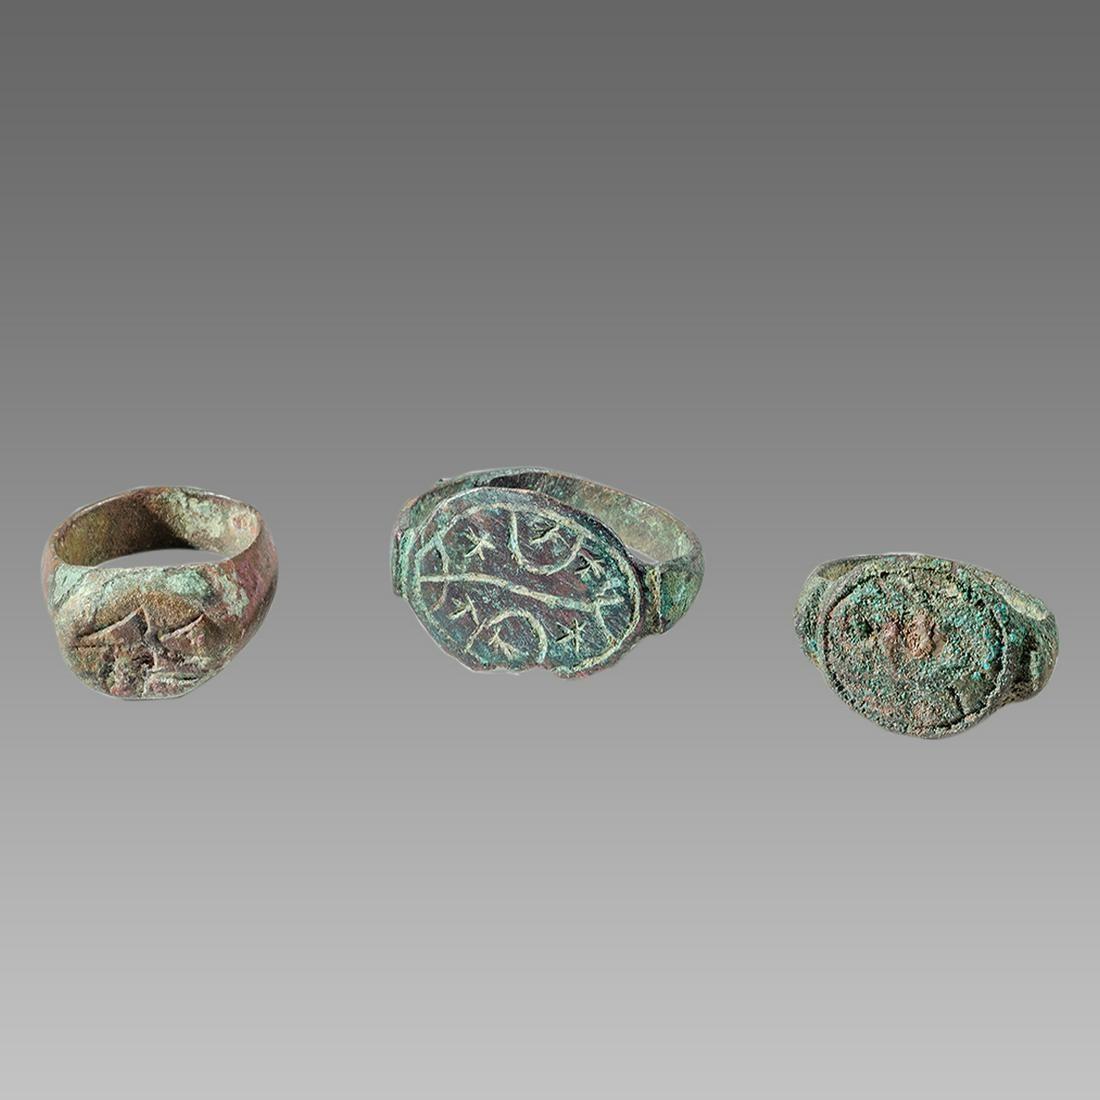 Lot of 3 Ancient Roman Bronze Rings c.2nd century AD.